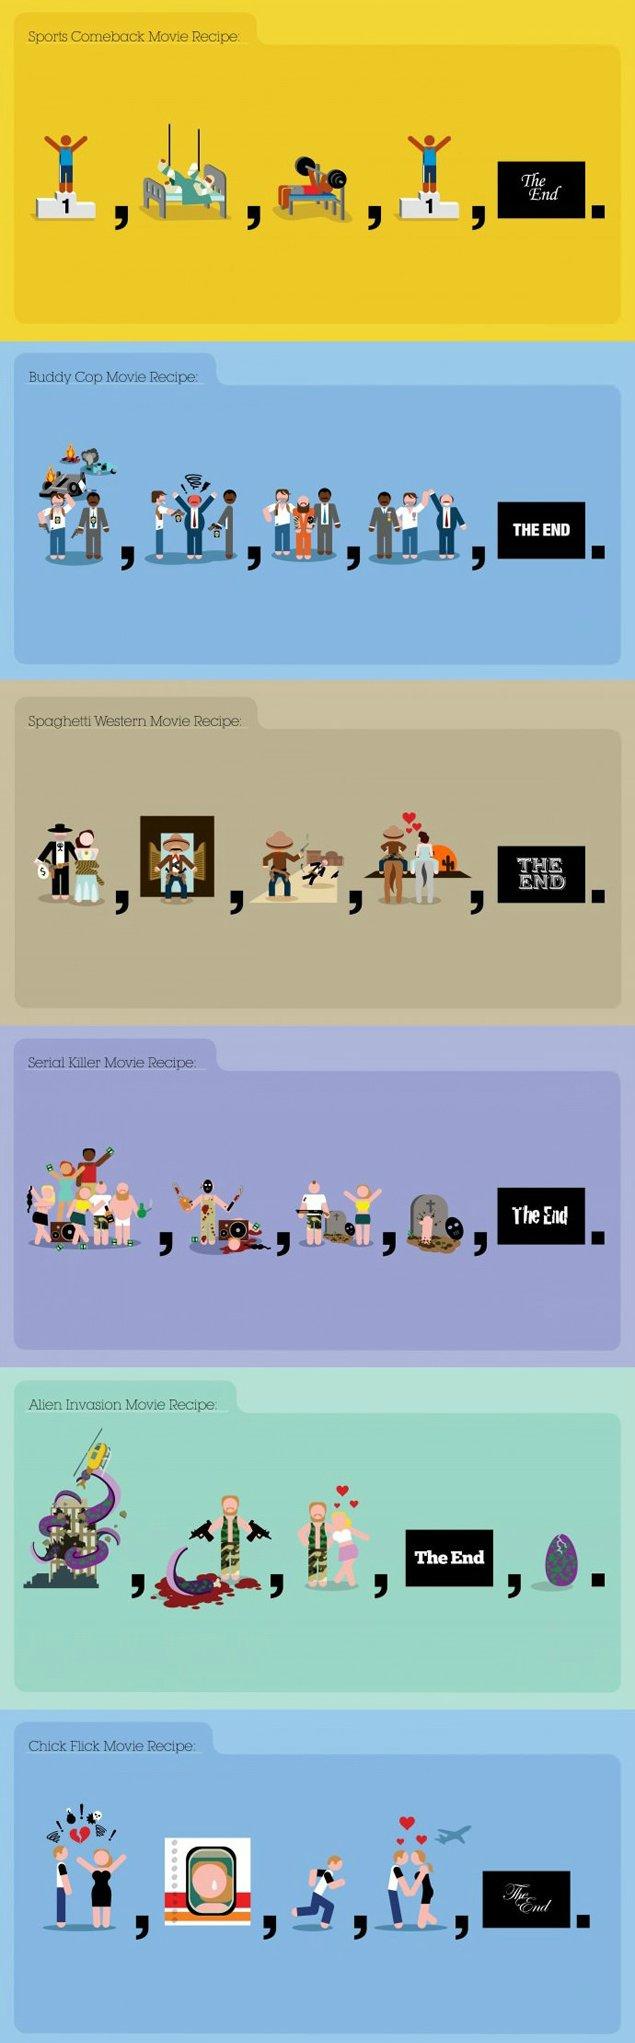 The Movie Genres Recipe [Infographic]